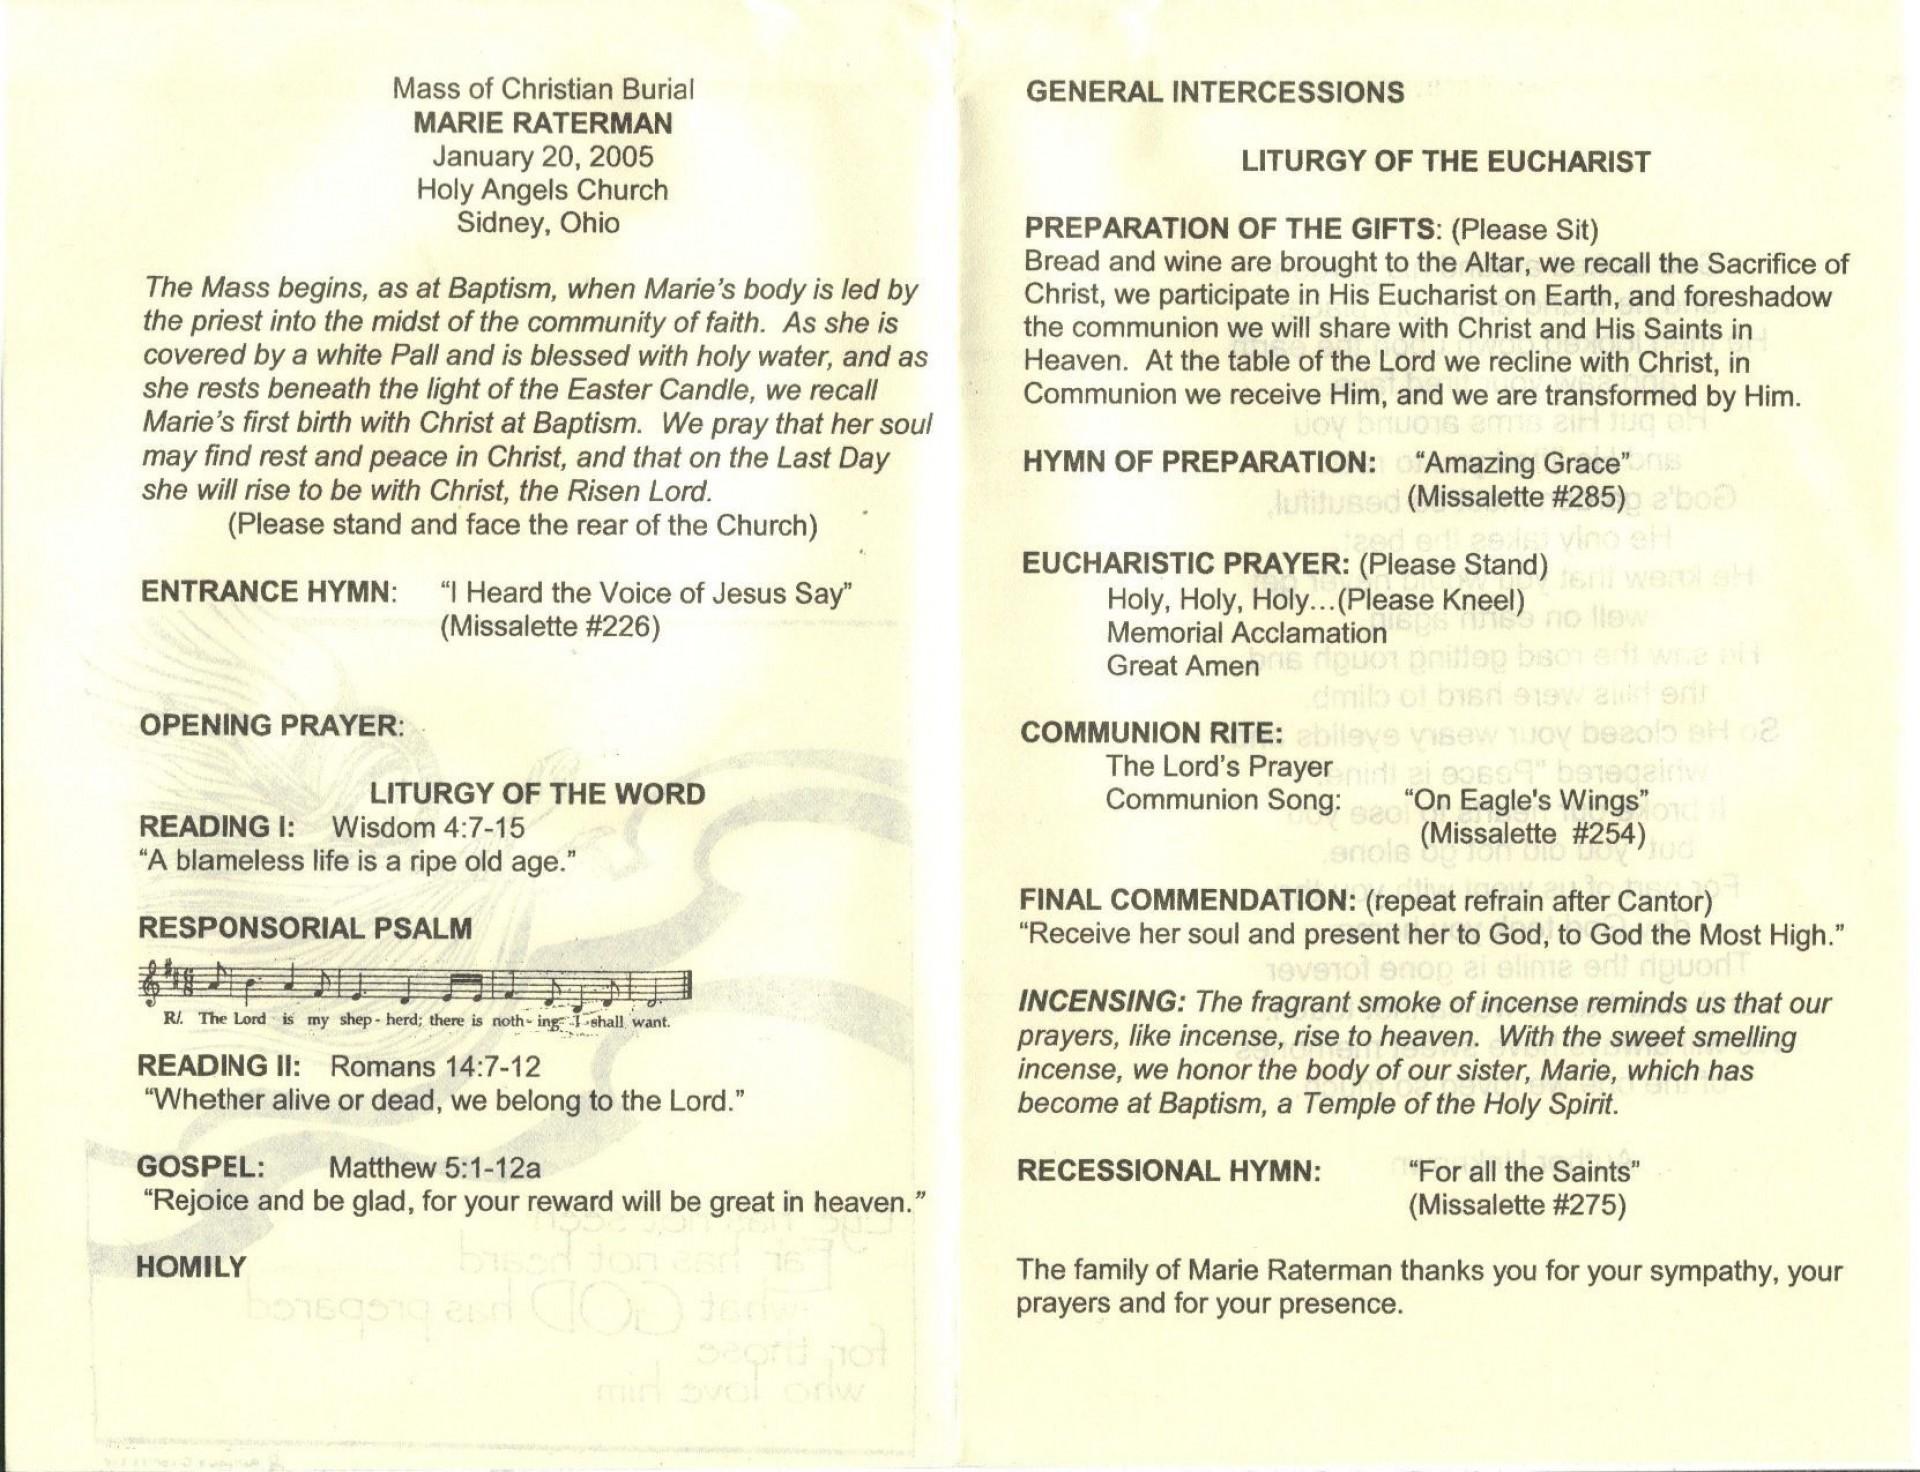 009 Phenomenal Catholic Funeral Program Template Photo  Mas Layout Free1920